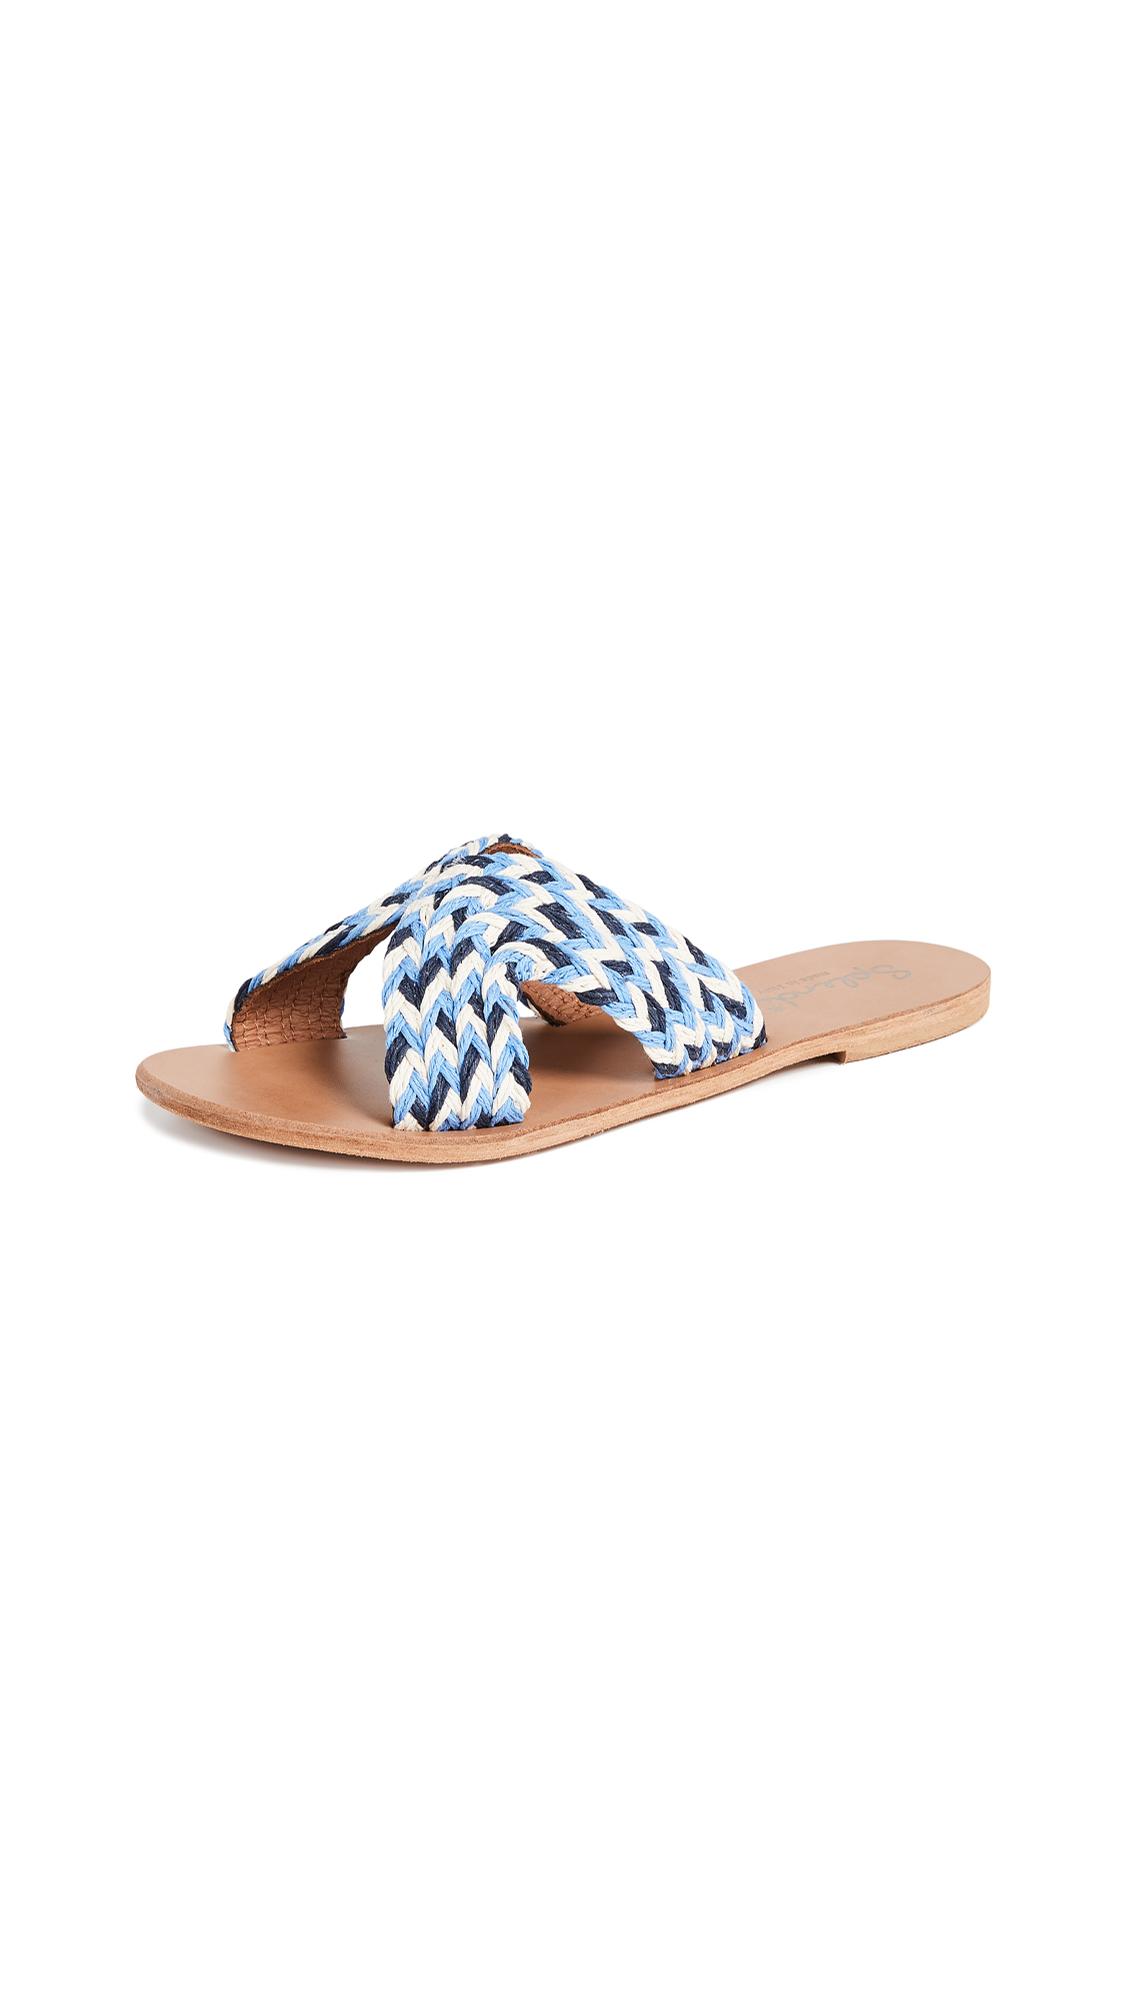 Splendid Sydney Slides - Blue Multi